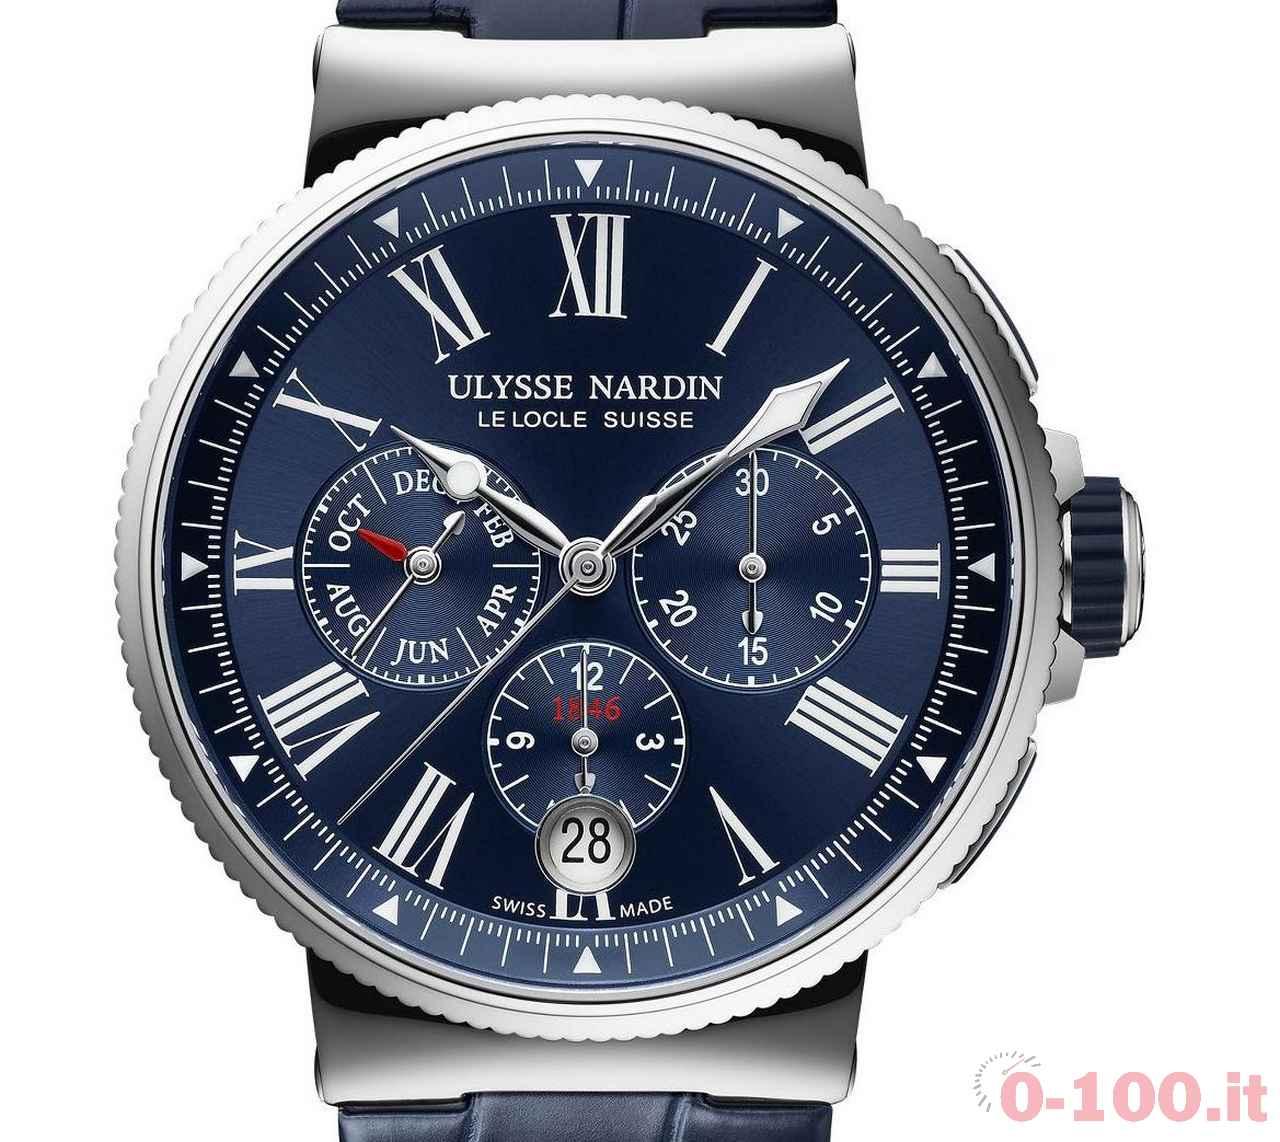 ulysse-nardin-marine-chronograph-annual-calendar-prezzo-price_0-1001